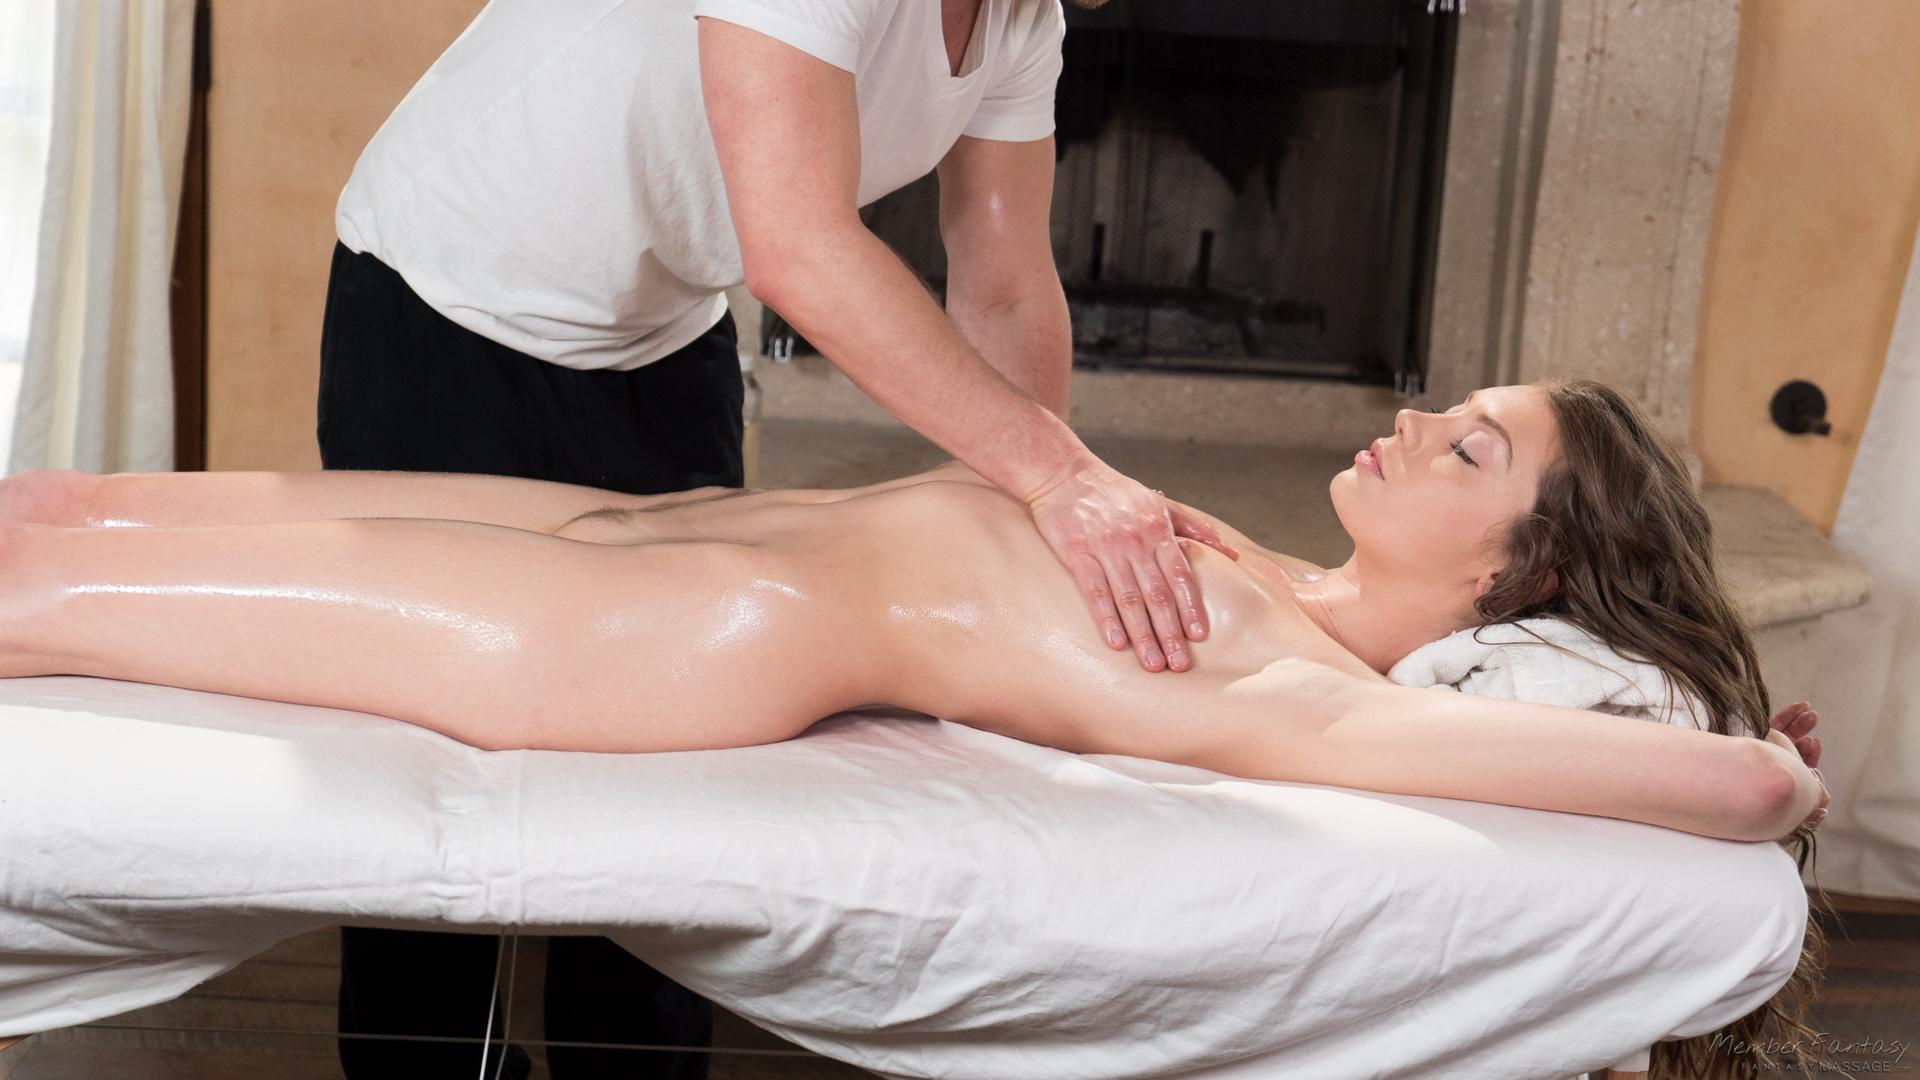 massage-watertown-erotic-solicit-brandi-chastain-naked